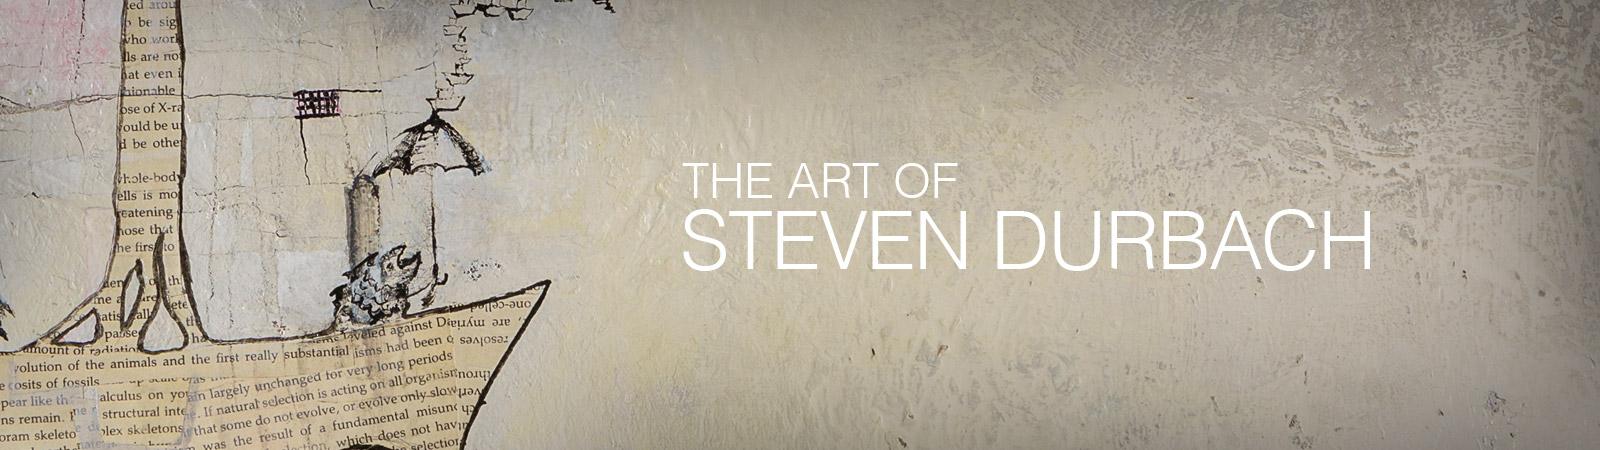 the-art-of-steven-durbach